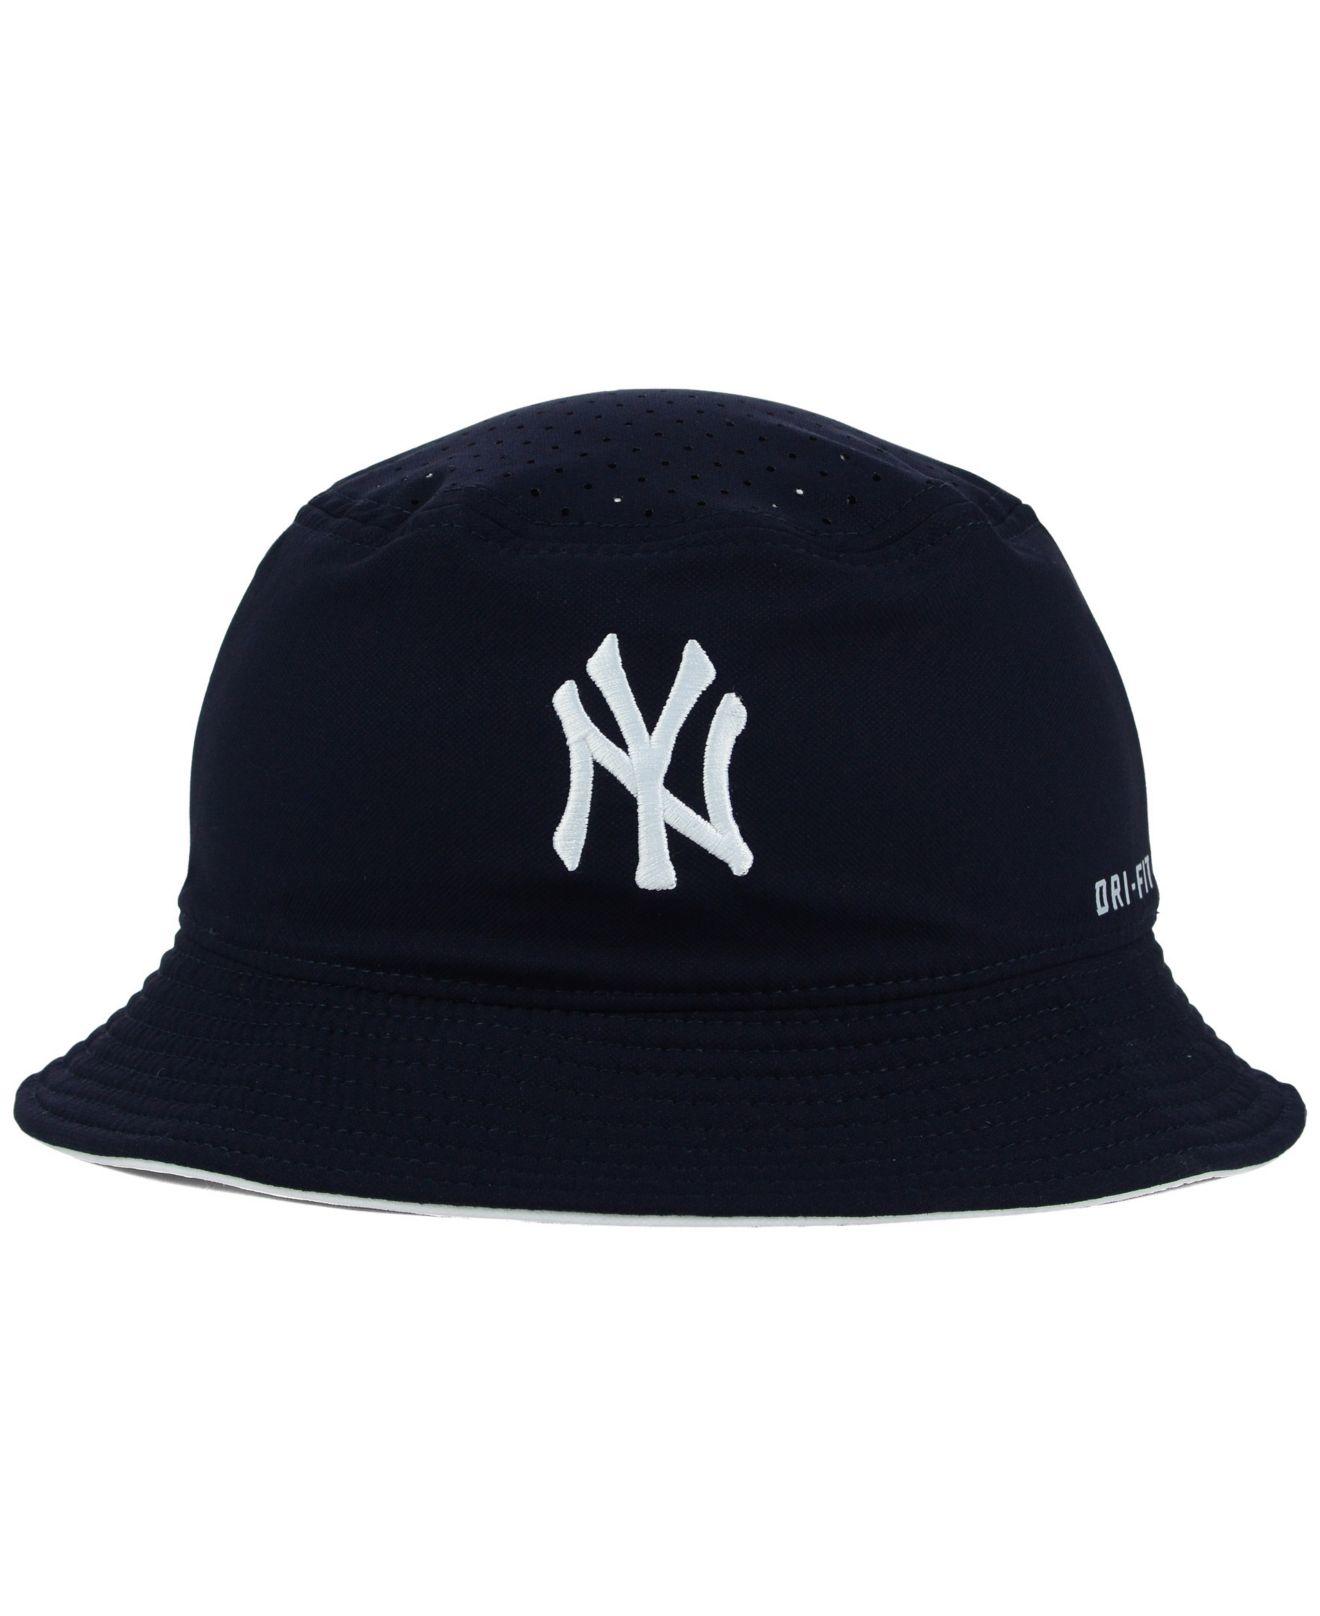 f58fe16462 Nike New York Yankees Vapor Dri-fit Bucket Hat in Blue for Men - Lyst